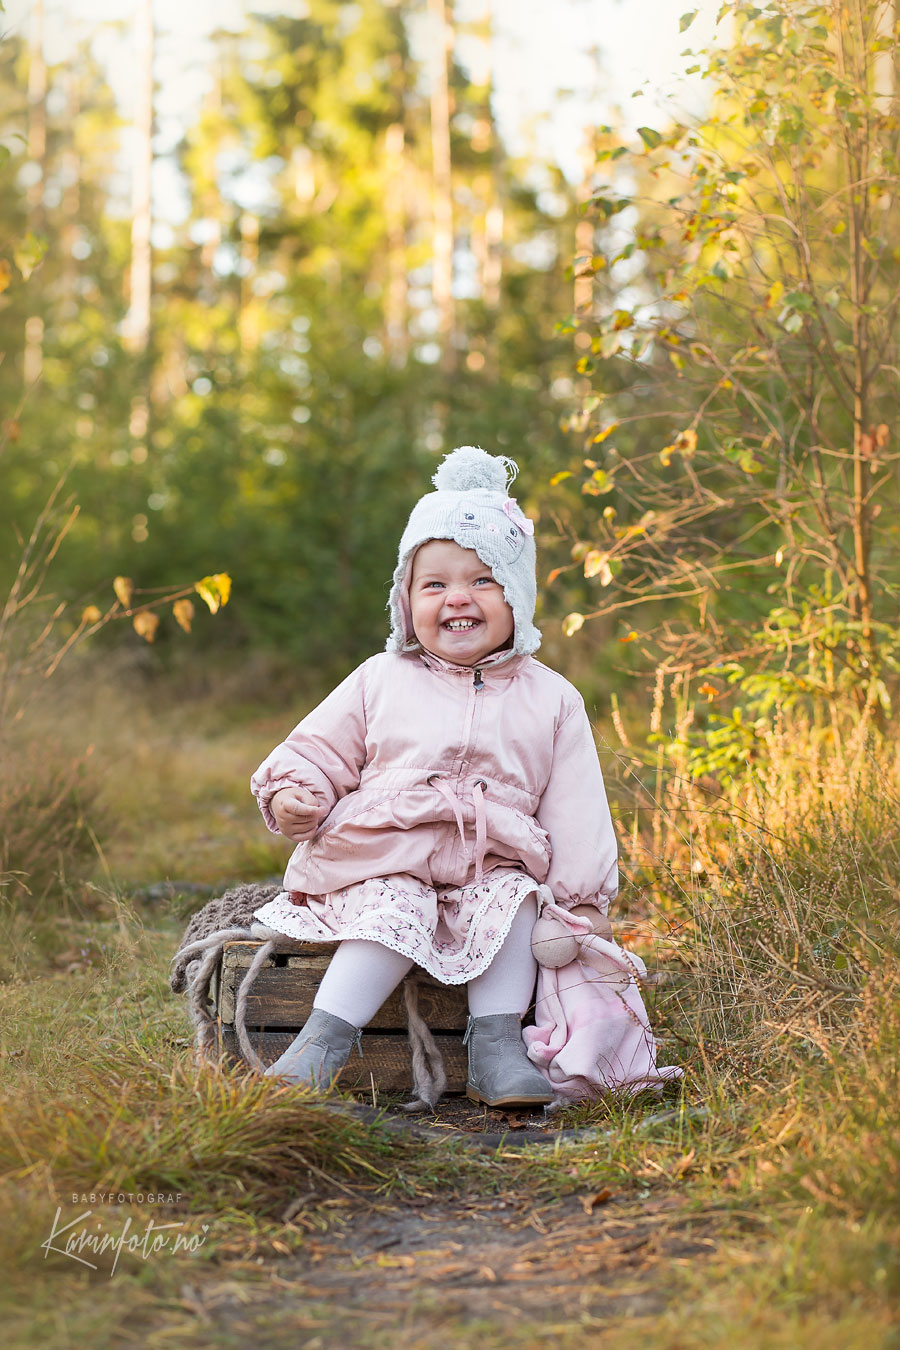 Ettarsfotografering,sarpsborg,babyfotograf,babyfotografering,ettarsfoto,utendorsfotografering,Kalnes,Newbie